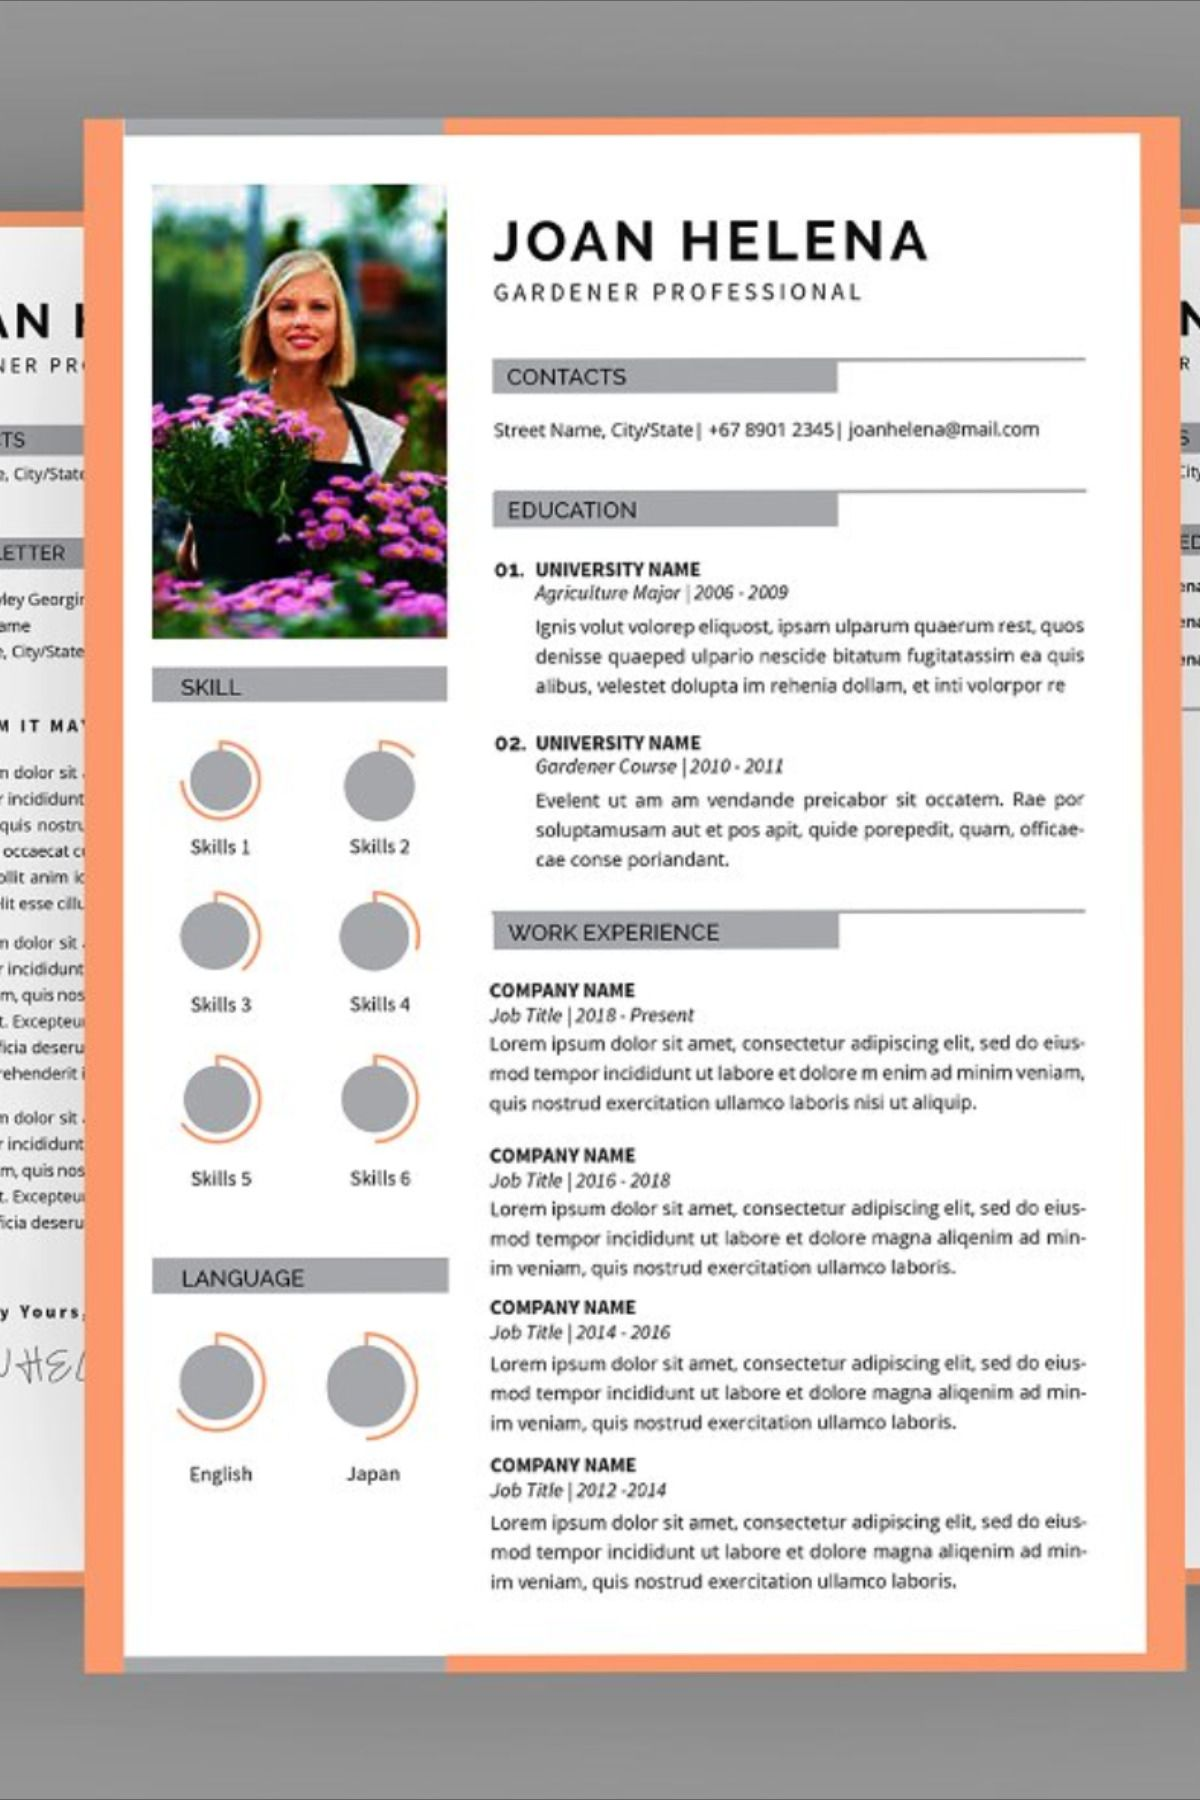 Joan gardener resume designer this layout is suitable for